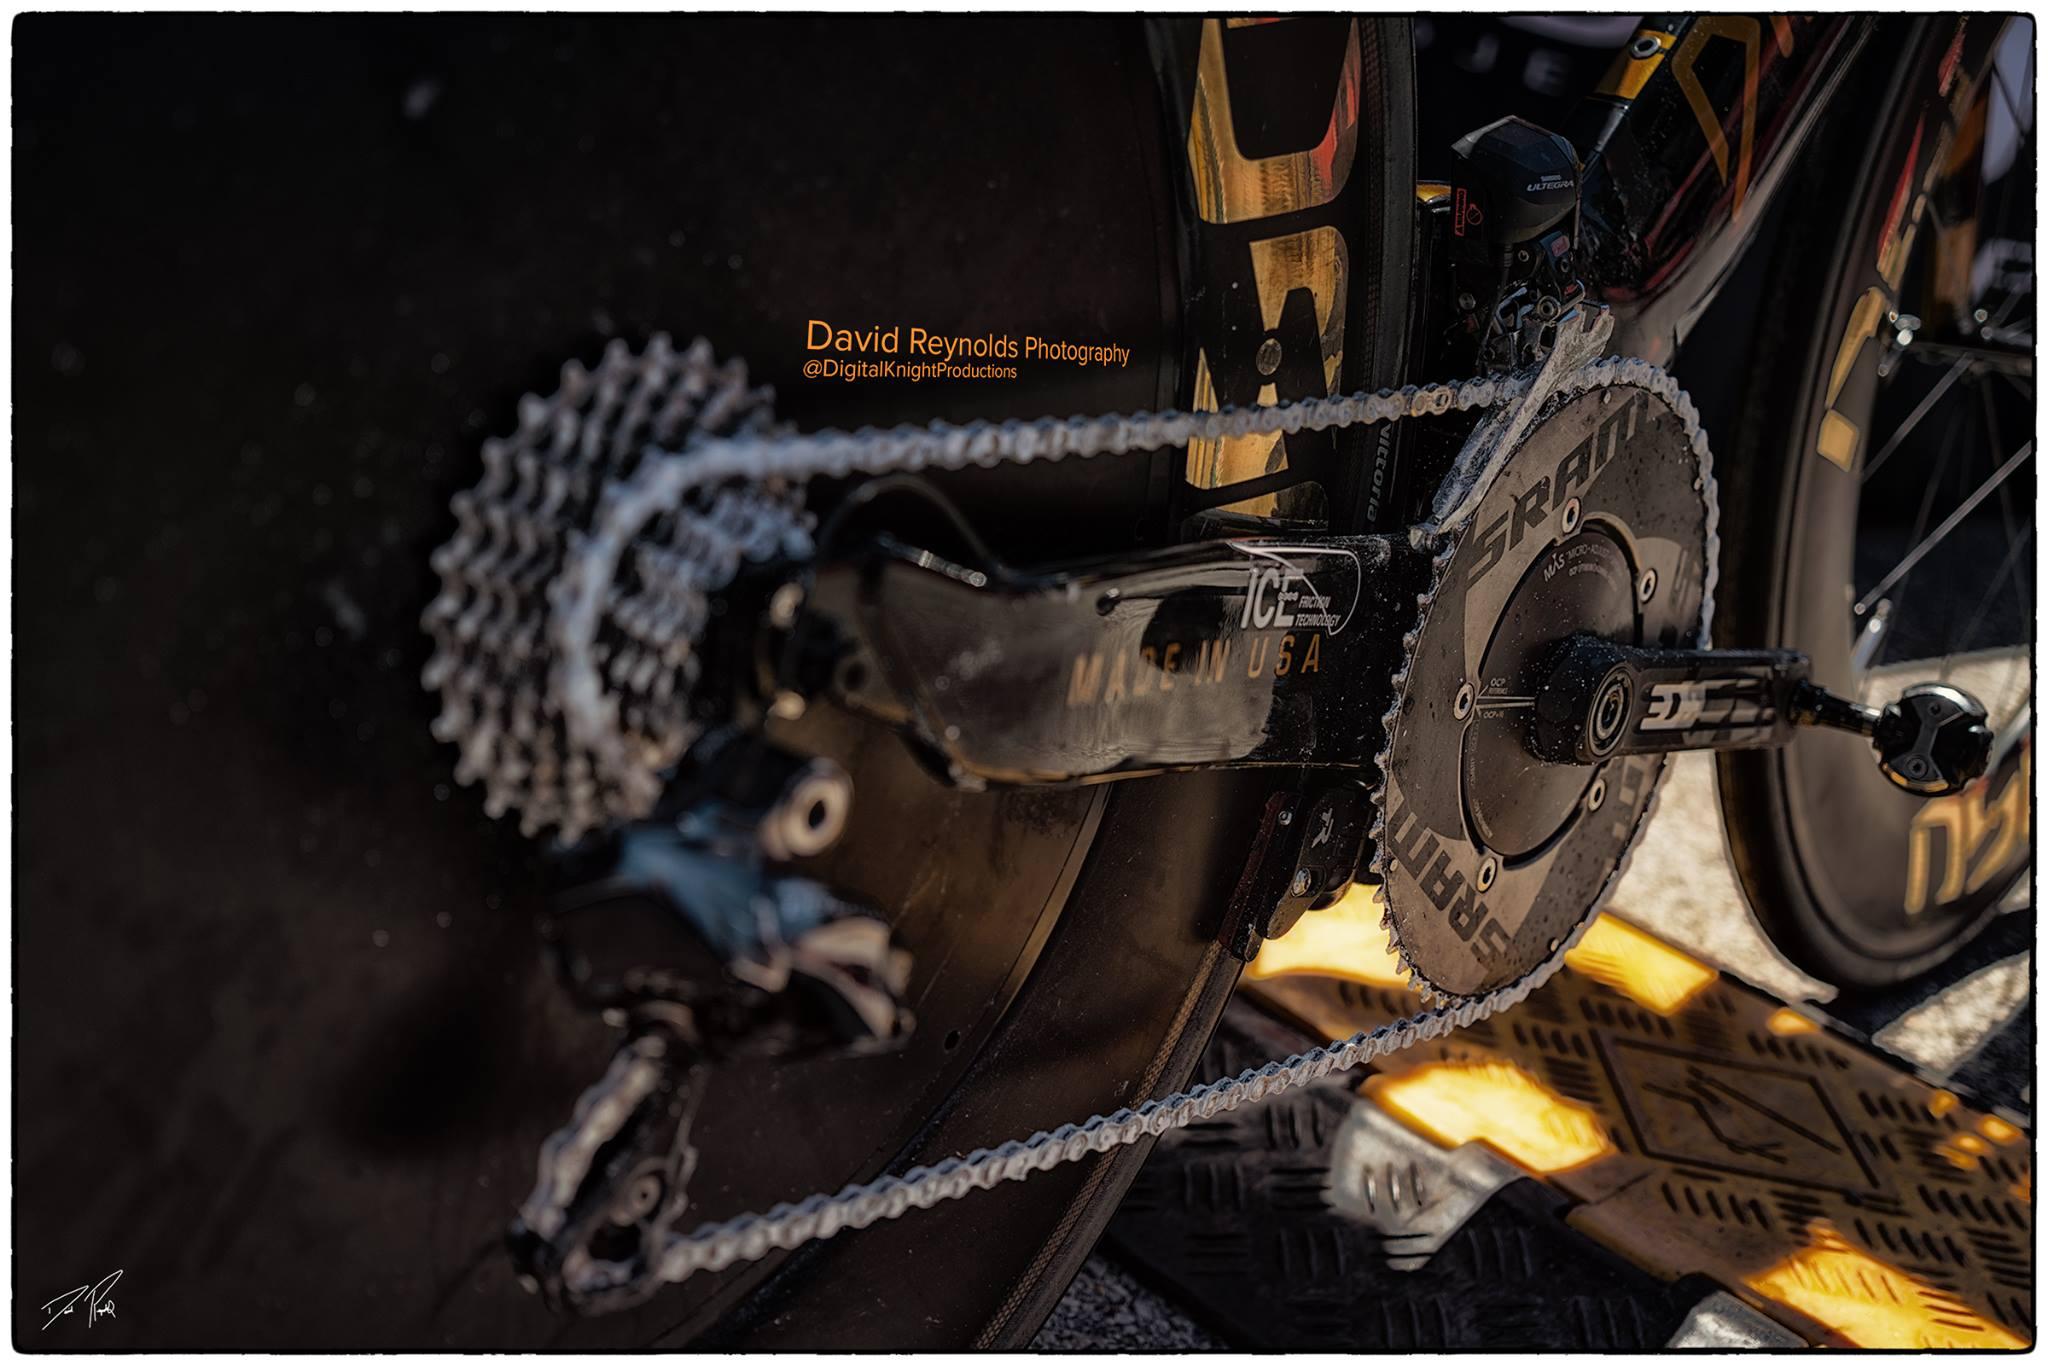 Coach_Terry_Wilson_Jesse _Vondracek_Ironman_Texas_Bike_Digital_Knight_Productions_check_in_Chain.jpg